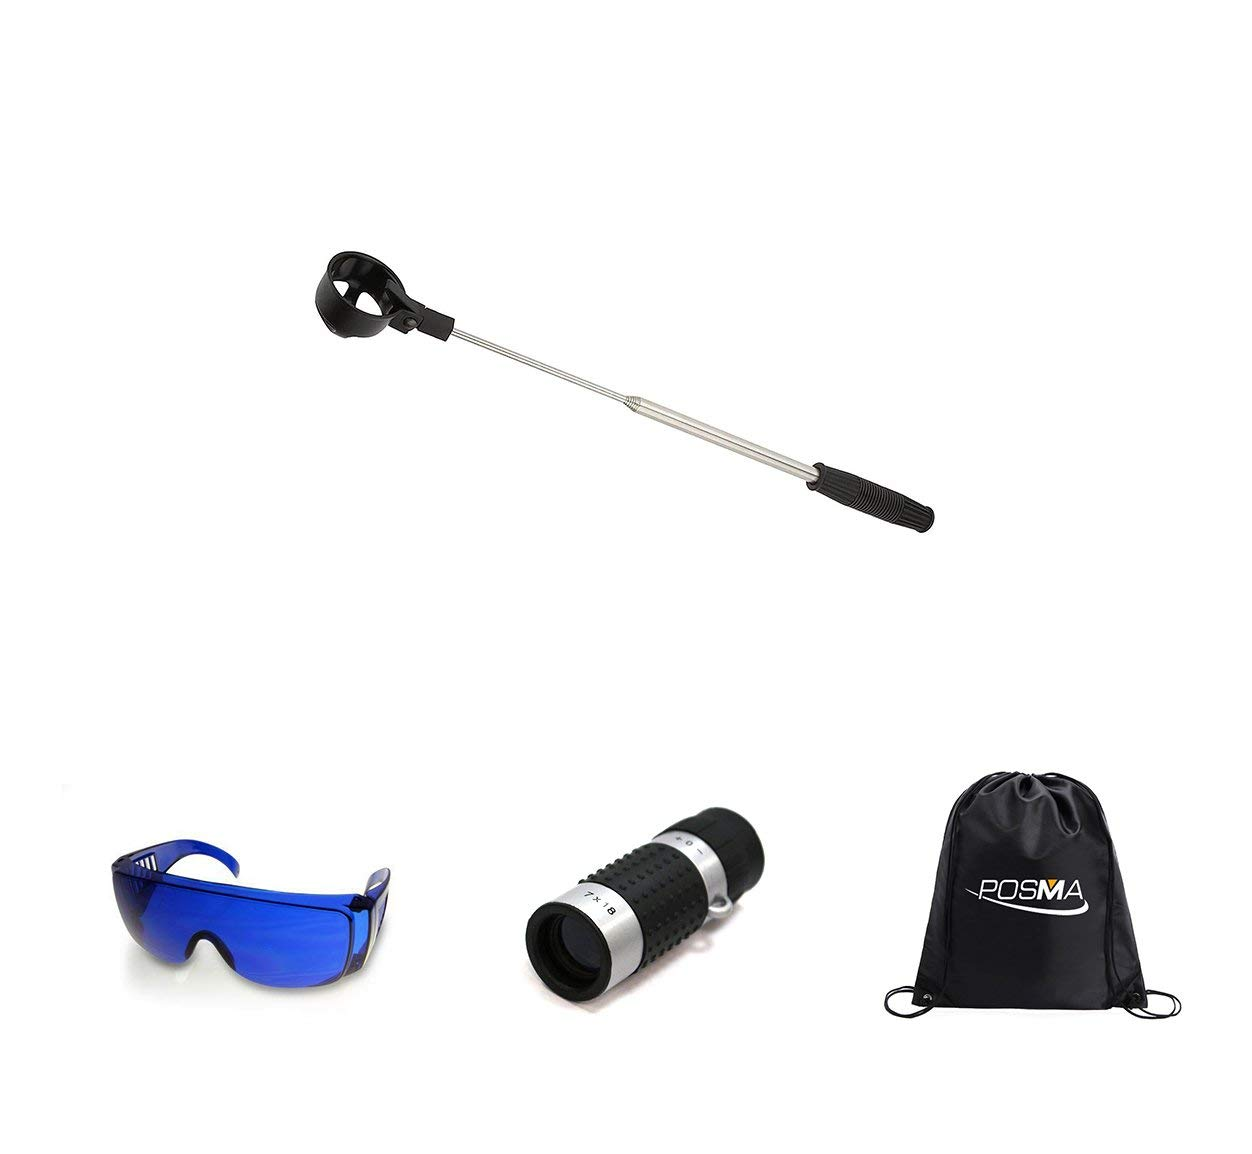 POSMA BR050I Golf 5 section Retrectable 2m Golf Ball Retriever Bundle Set with 1pc Golf Ranger Finder(GF100) + 1pc Golf Ball Finder Hunter Retriever Glasses + 1pc black cinch sack carry bag